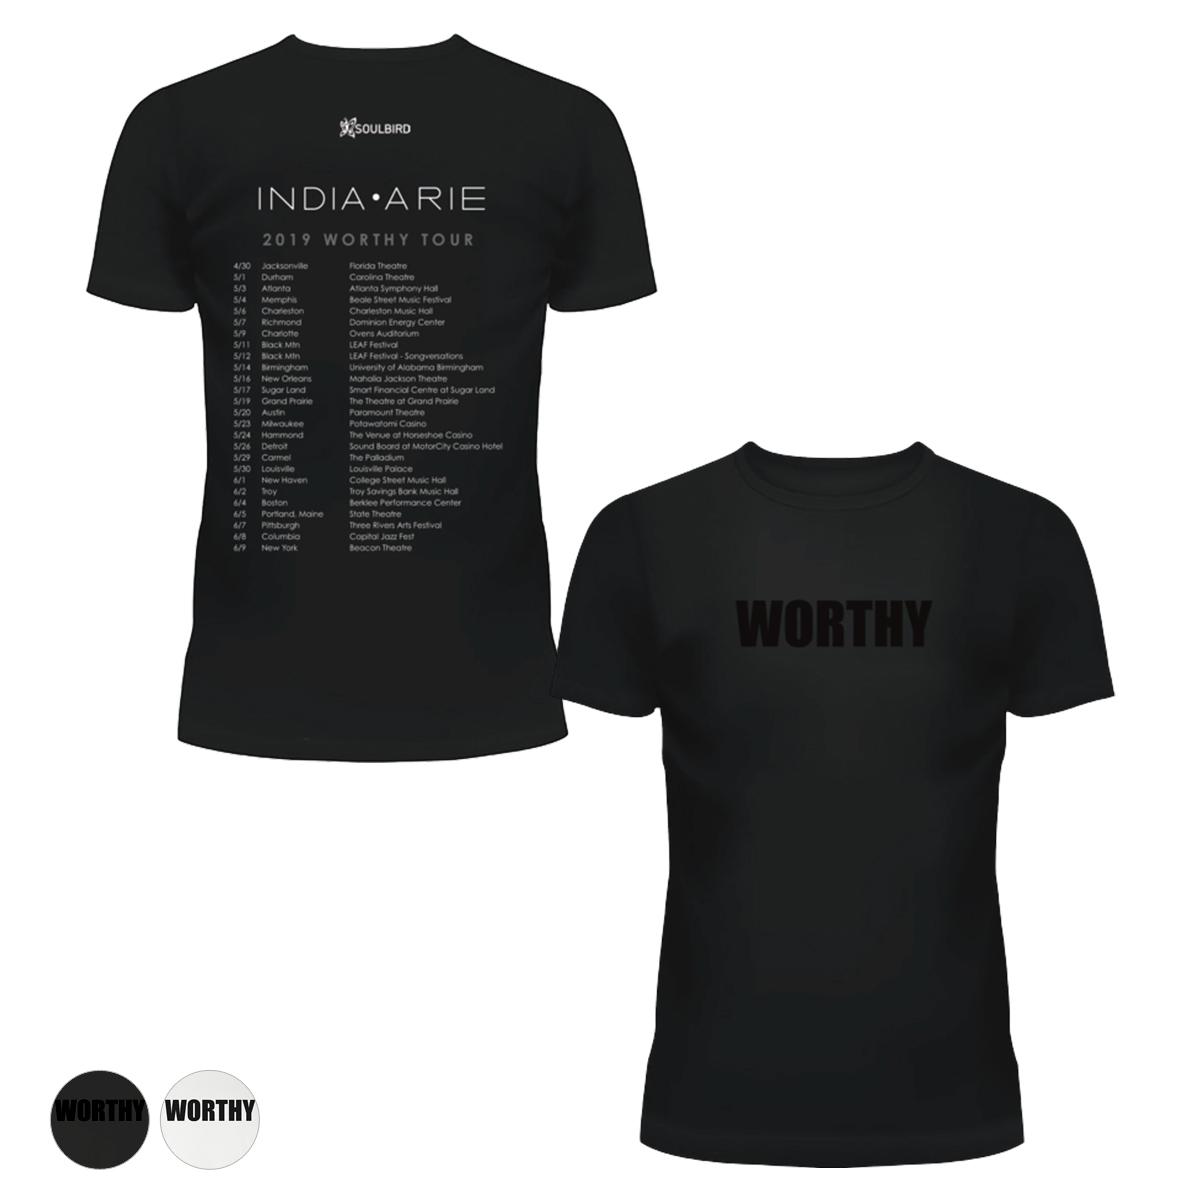 Worthy Tour T-Shirt